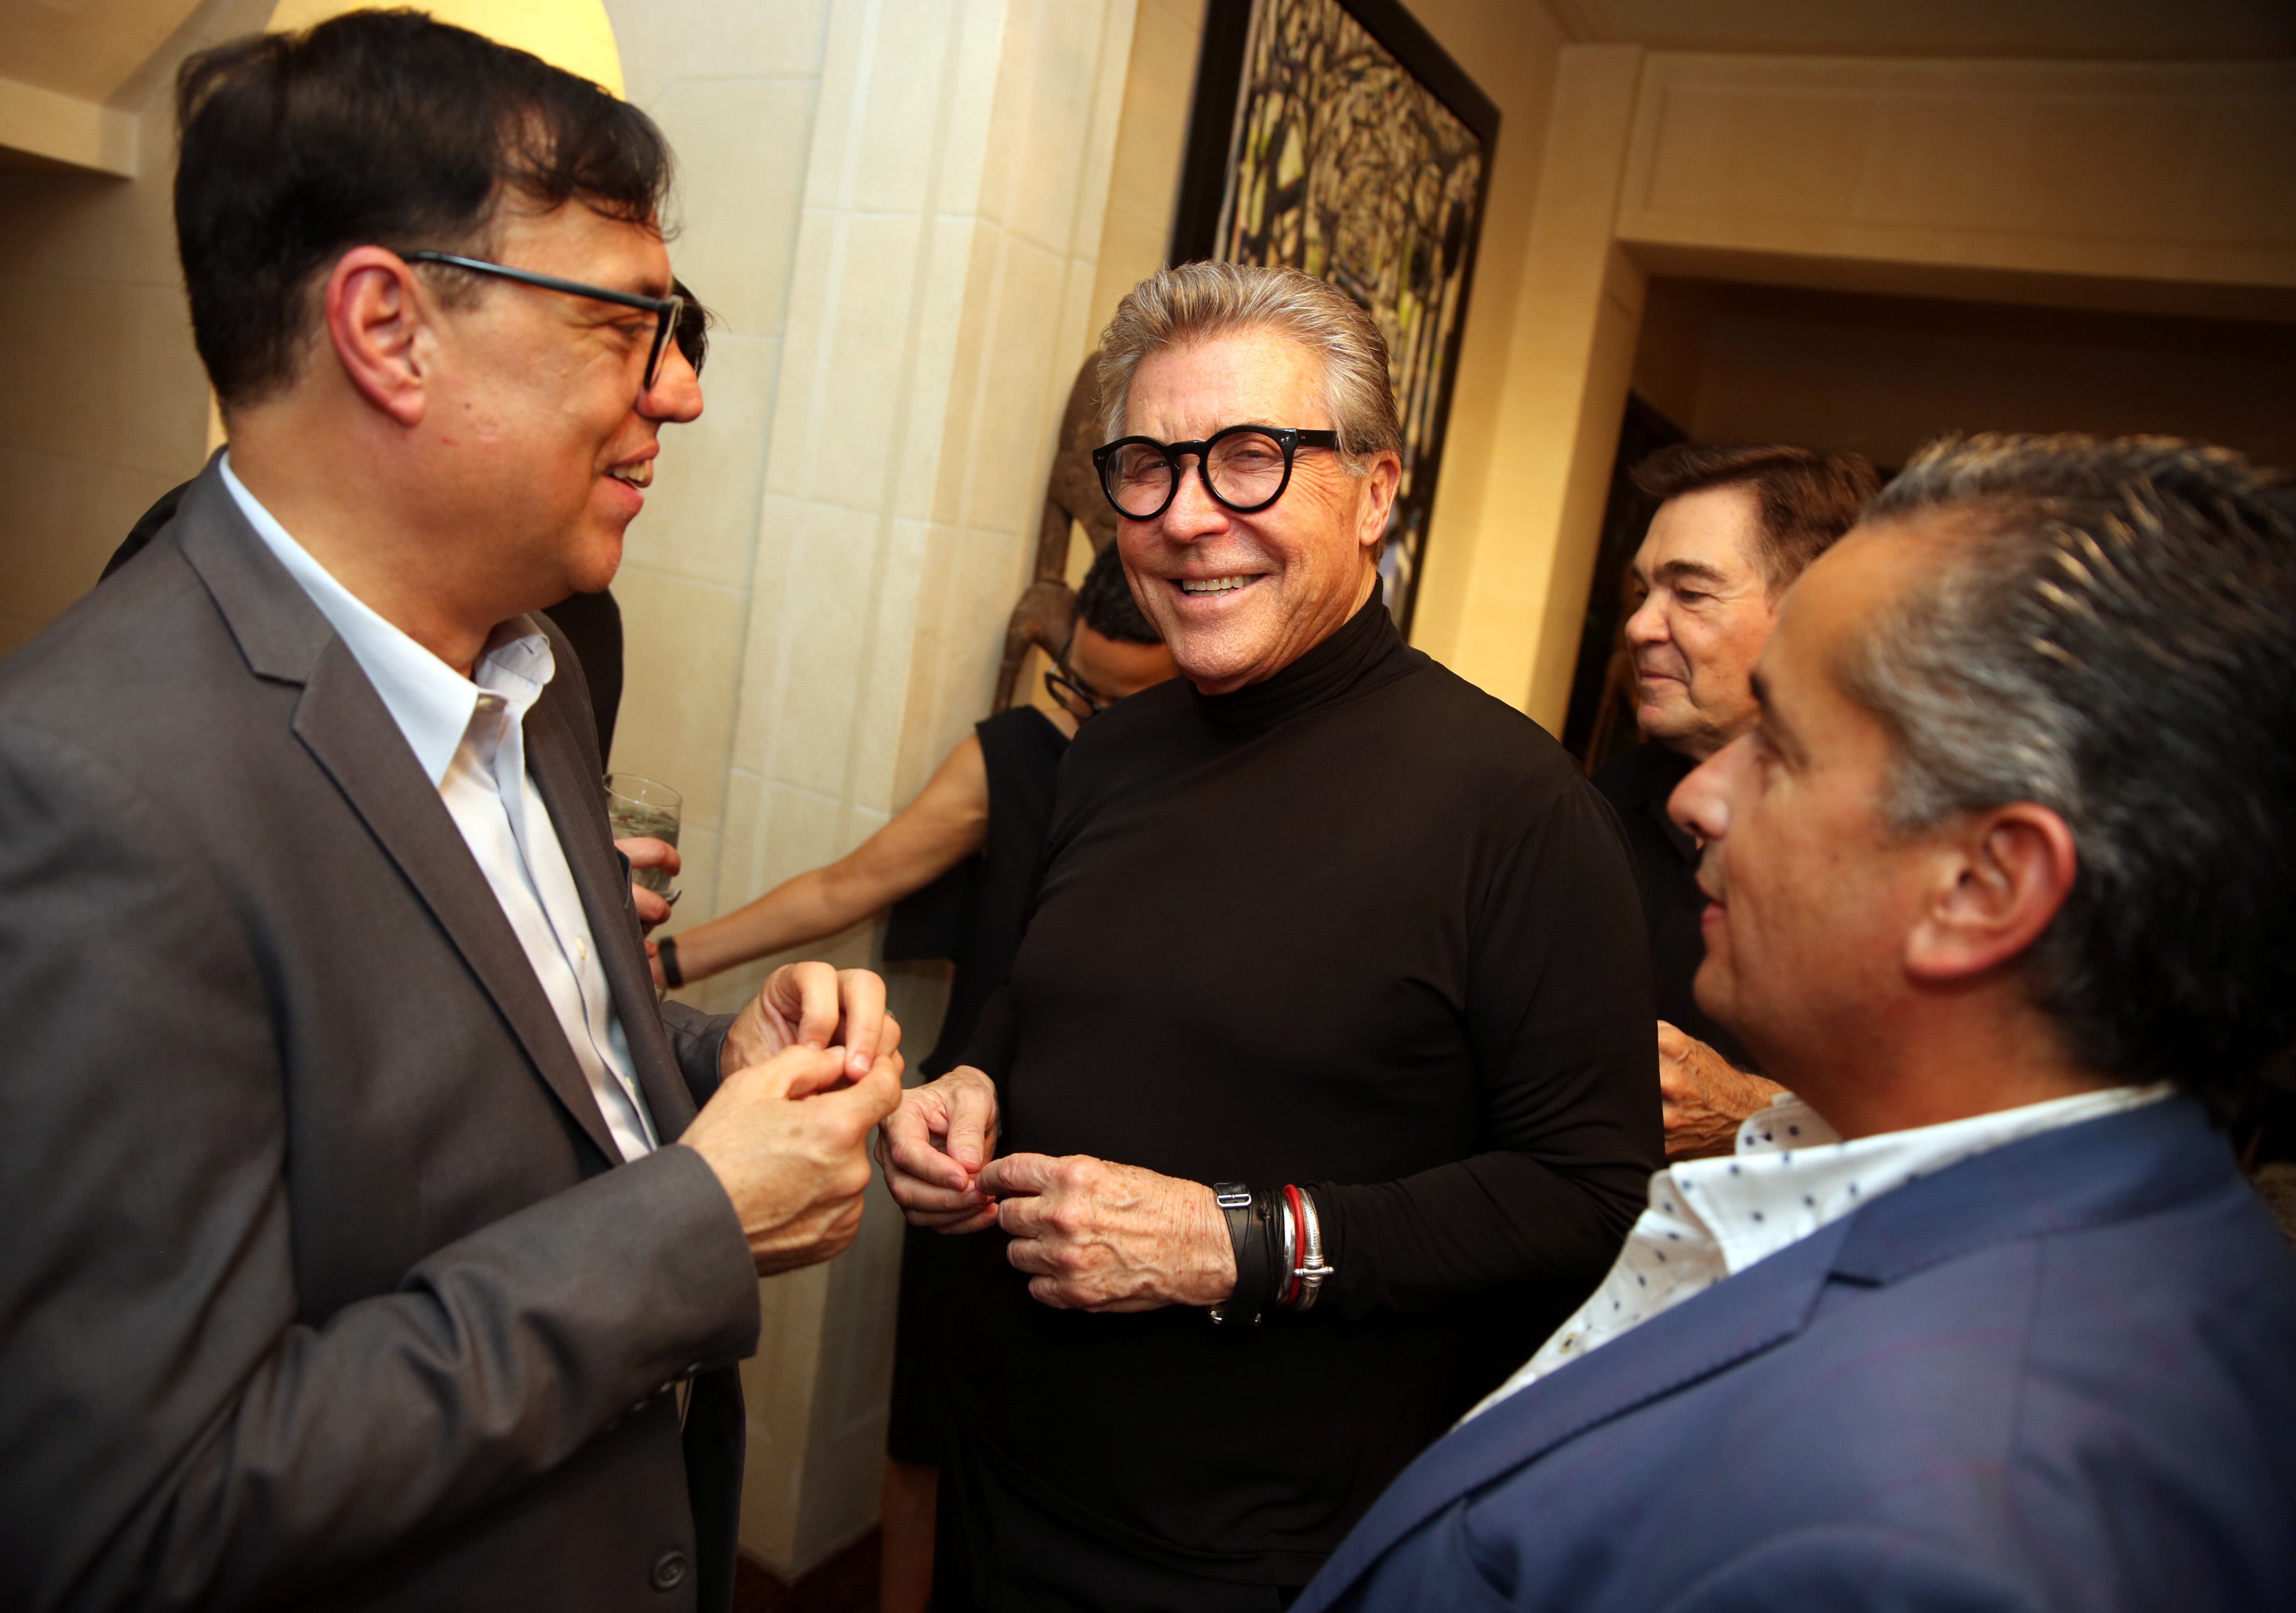 David Méndez, Nono Maldonado y Juan Ernesto Ayala. (José. R. Pérez Centeno)